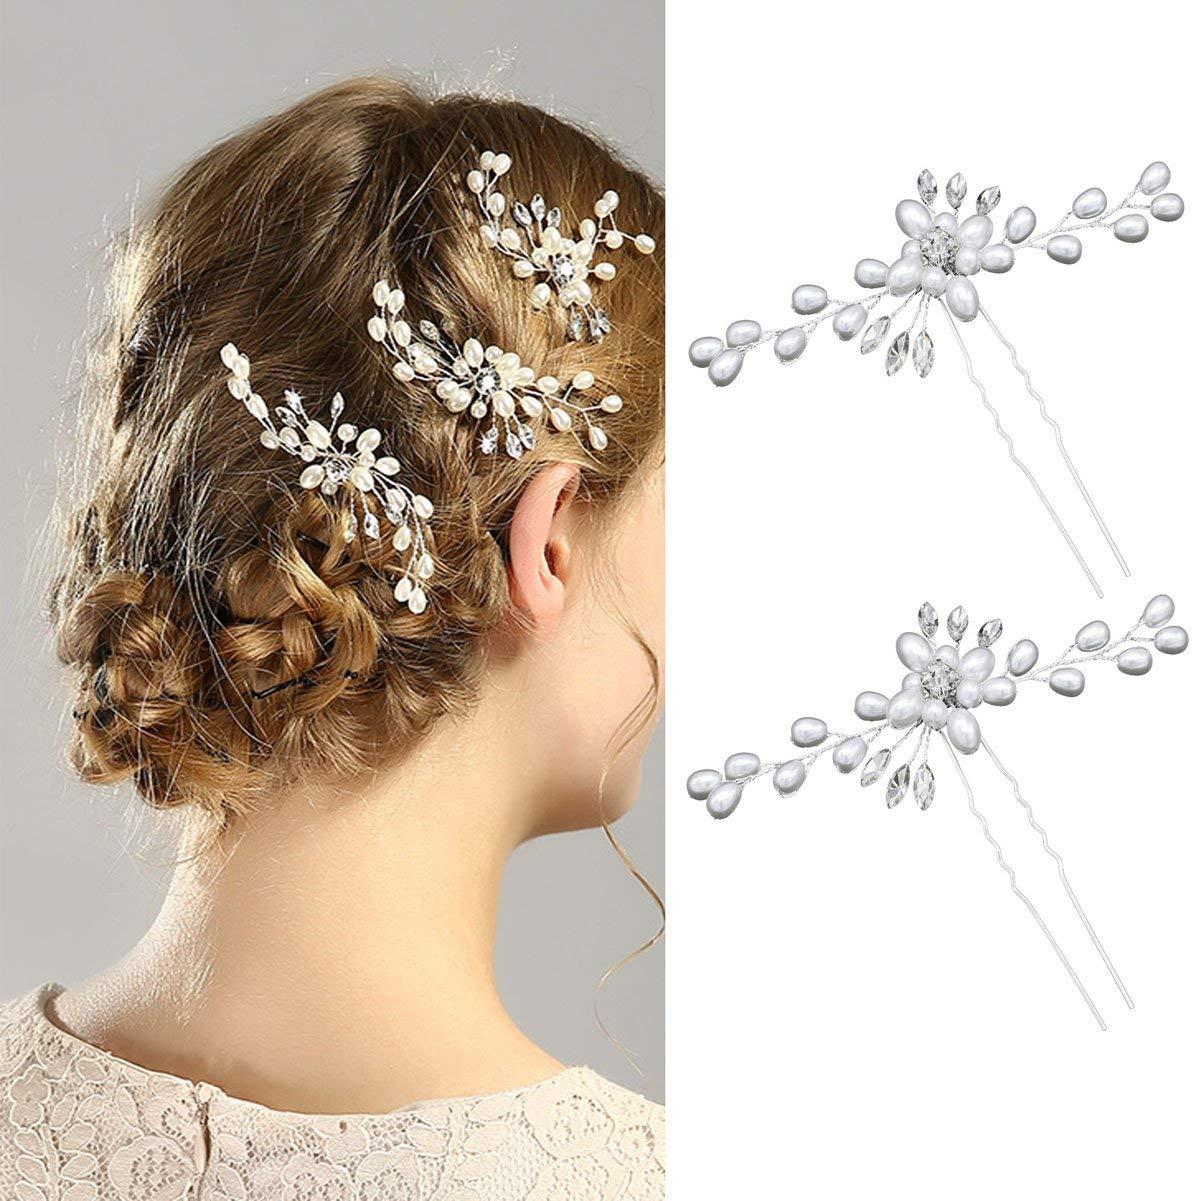 NEW HAIR GRIP WEDDING PARTY BRIDAL PROM PINS PARTY DIAMANTE WOMEN HAIRPINS  B3